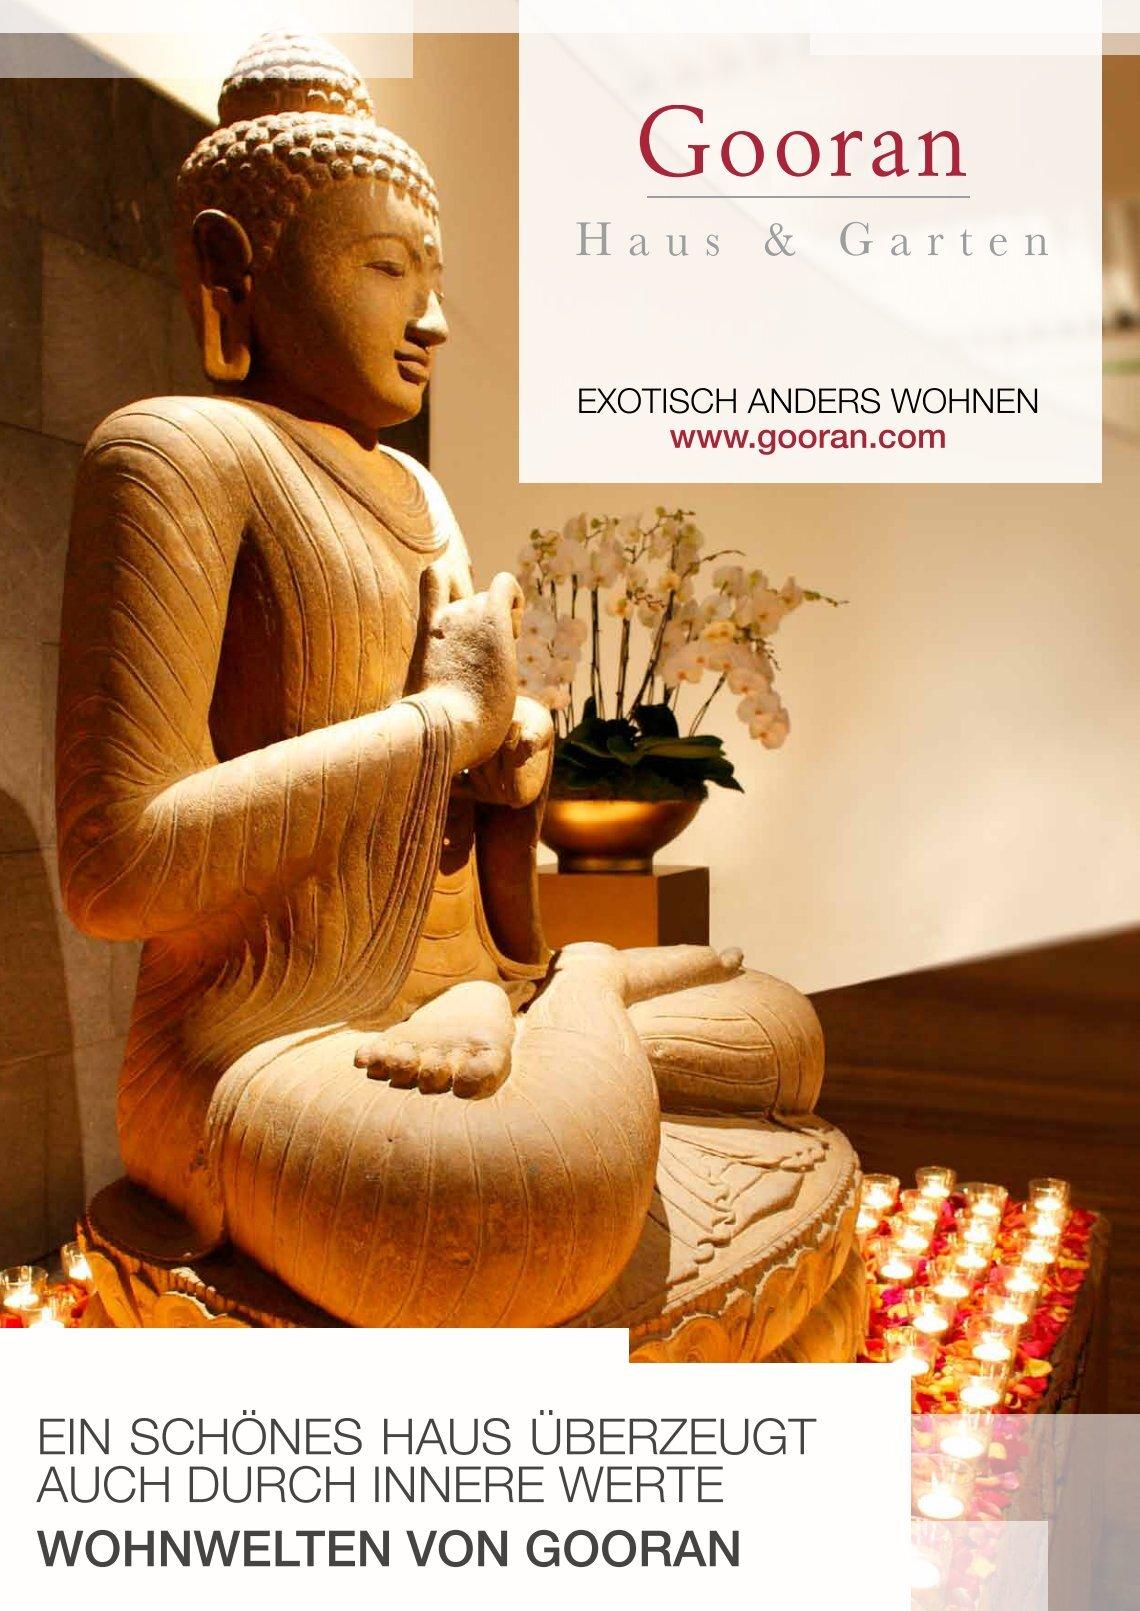 Gooran Essen 4 free magazines from gooran com